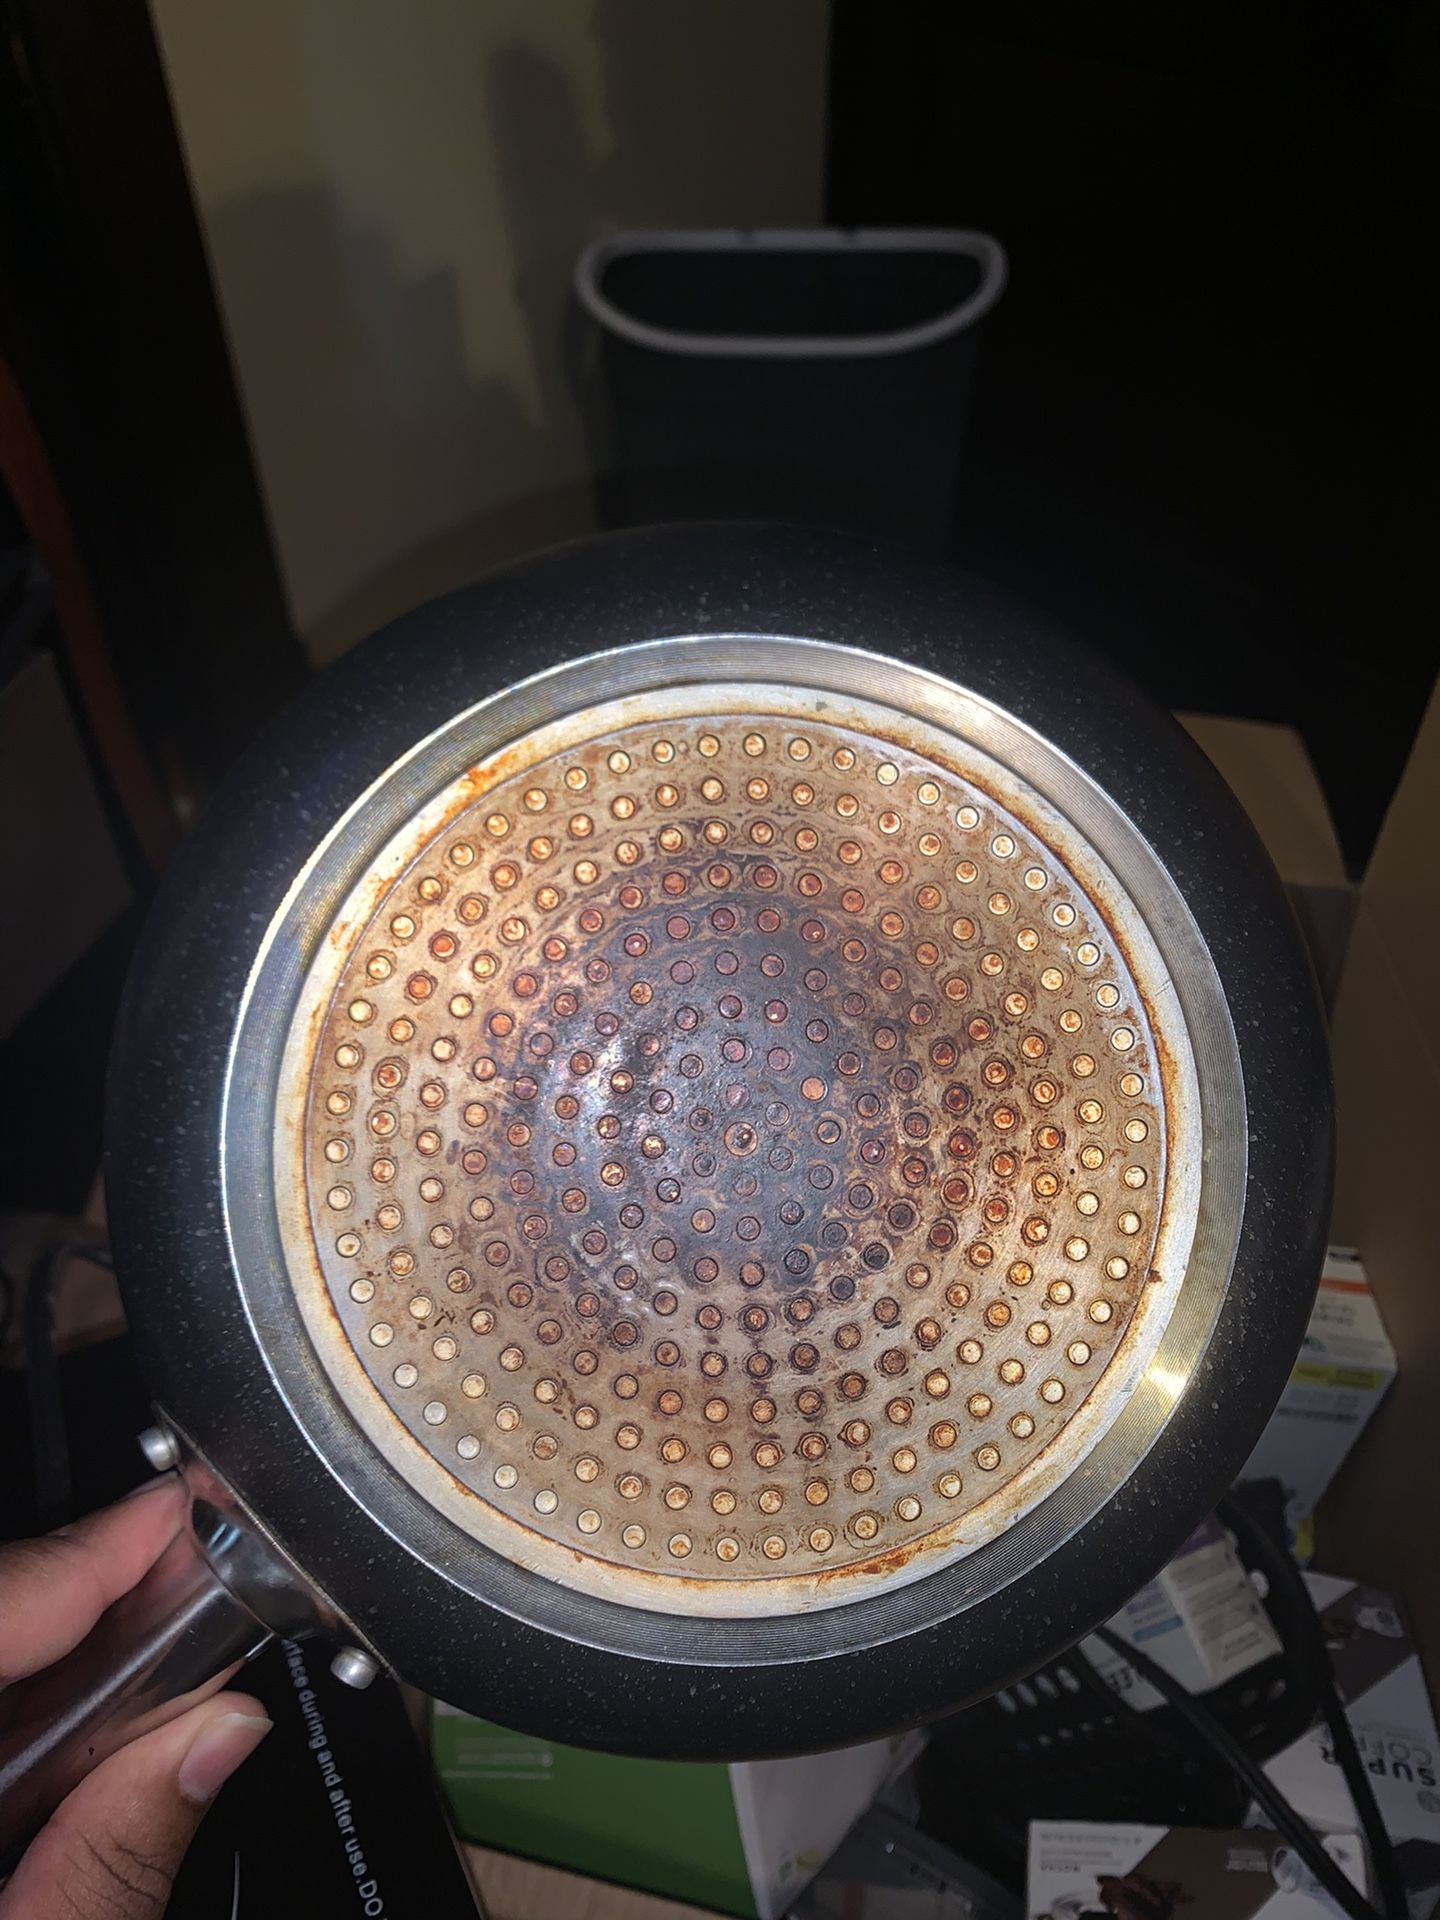 Counter Top Burner Plus Sandwich Pan And Frying Pan